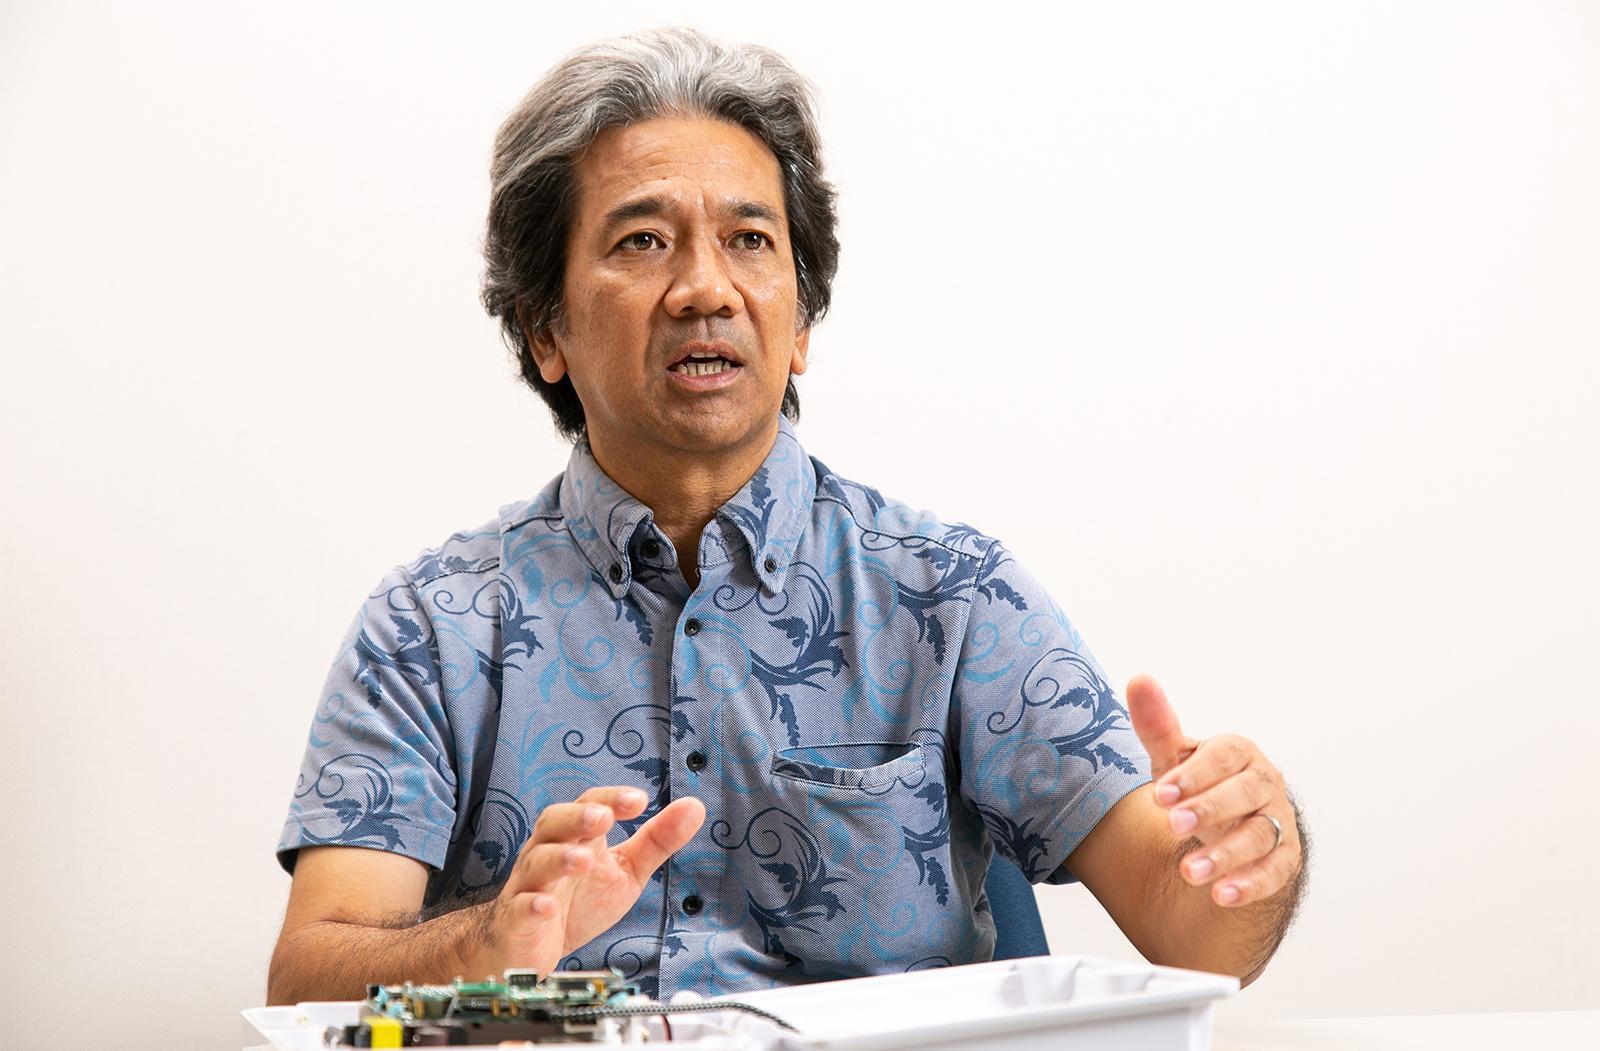 Photo: Naoto Higa, President, Nextems Co., Ltd.